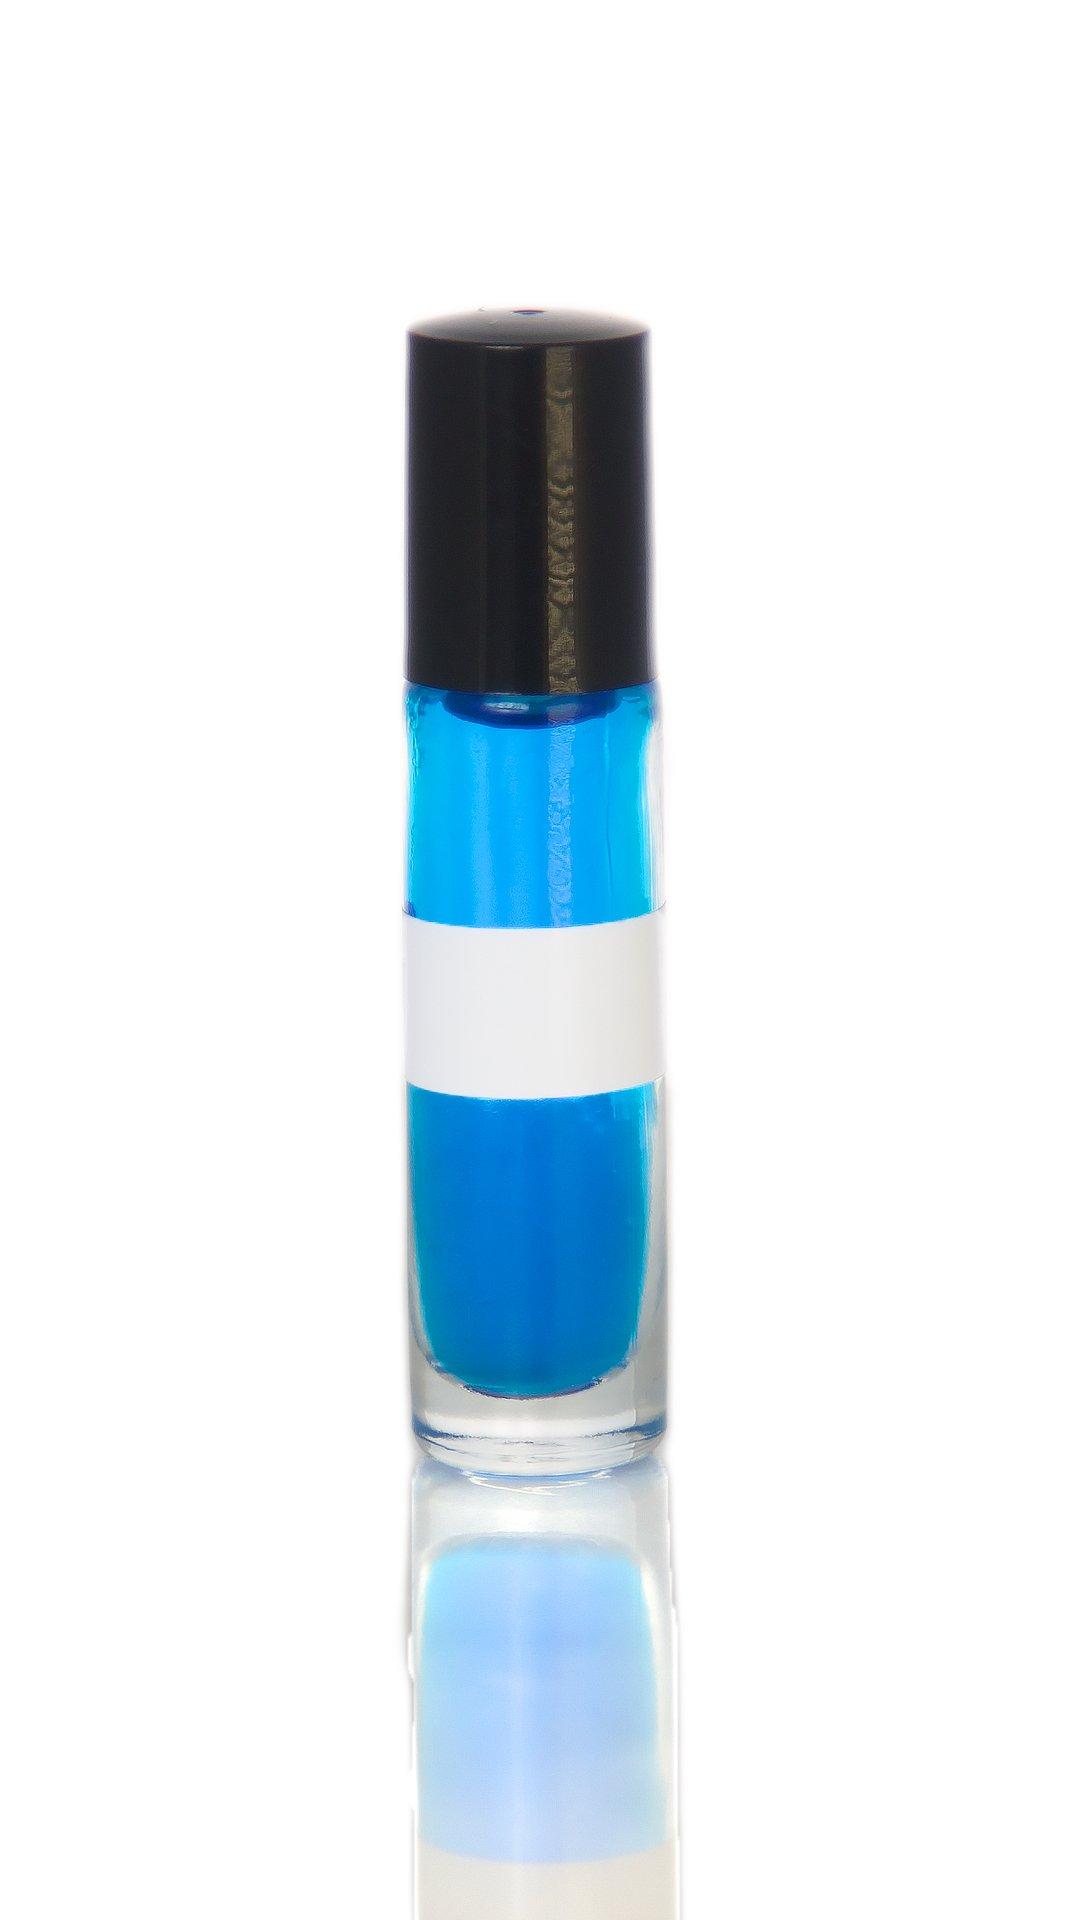 FragranceBodyOilz Impression of Versace Eros (Roll On) for Men Premium Hypoallergenic Cologne Body Oil, Affordable Generic Version (1/3 oz)